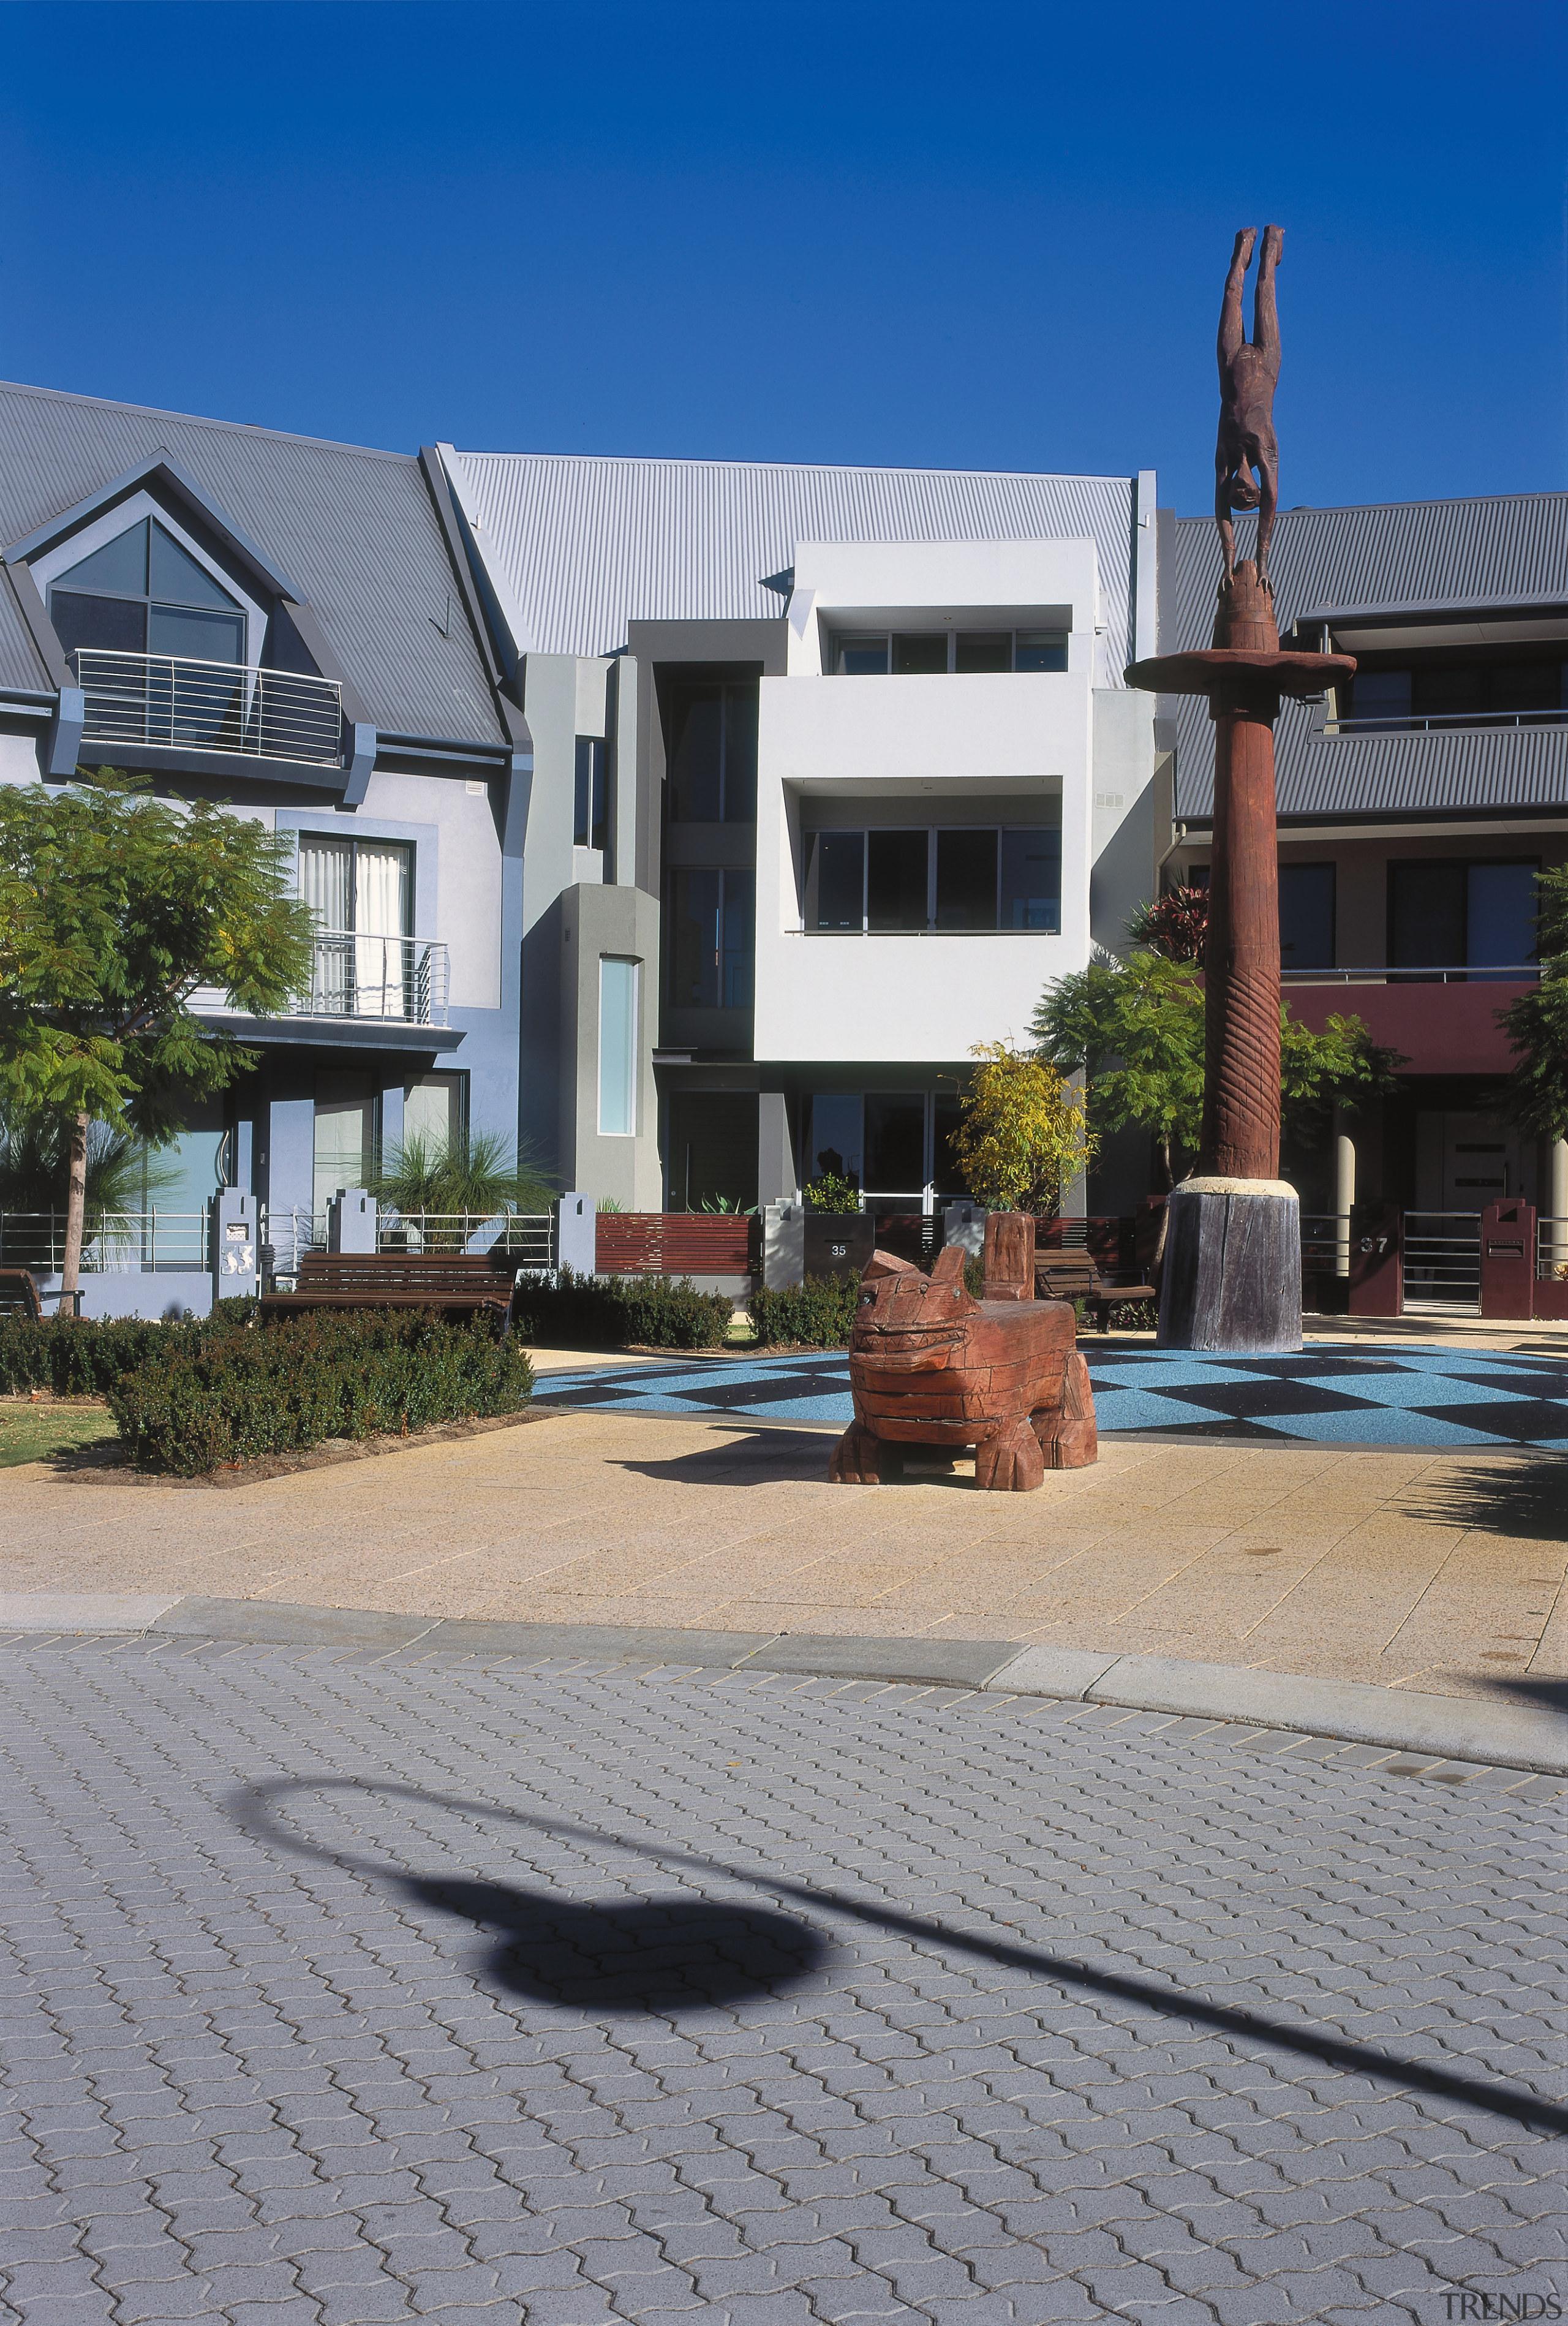 An exterior view of the home. - An building, estate, facade, home, house, neighbourhood, property, real estate, residential area, villa, gray